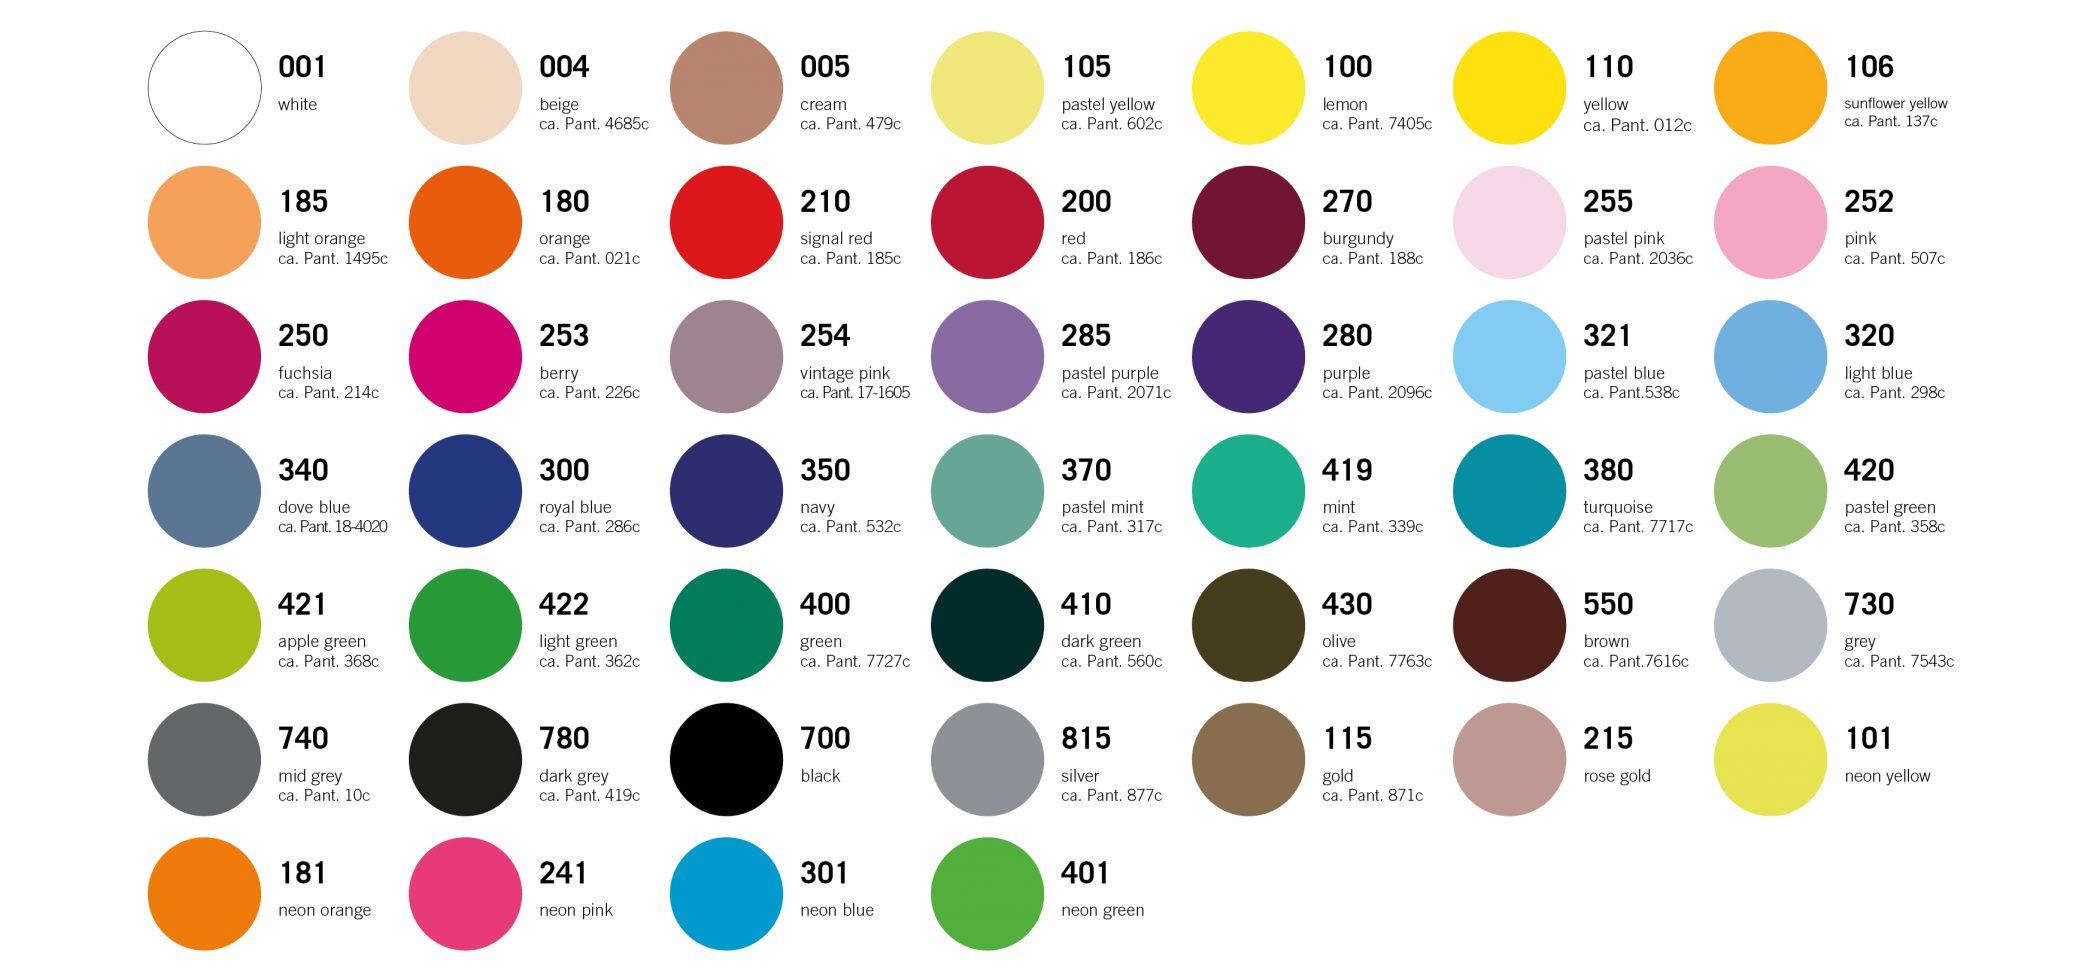 CAD-CUT_Farbauswahl-Color-selection_Stahls-Europe_Premium-Plus_07-21